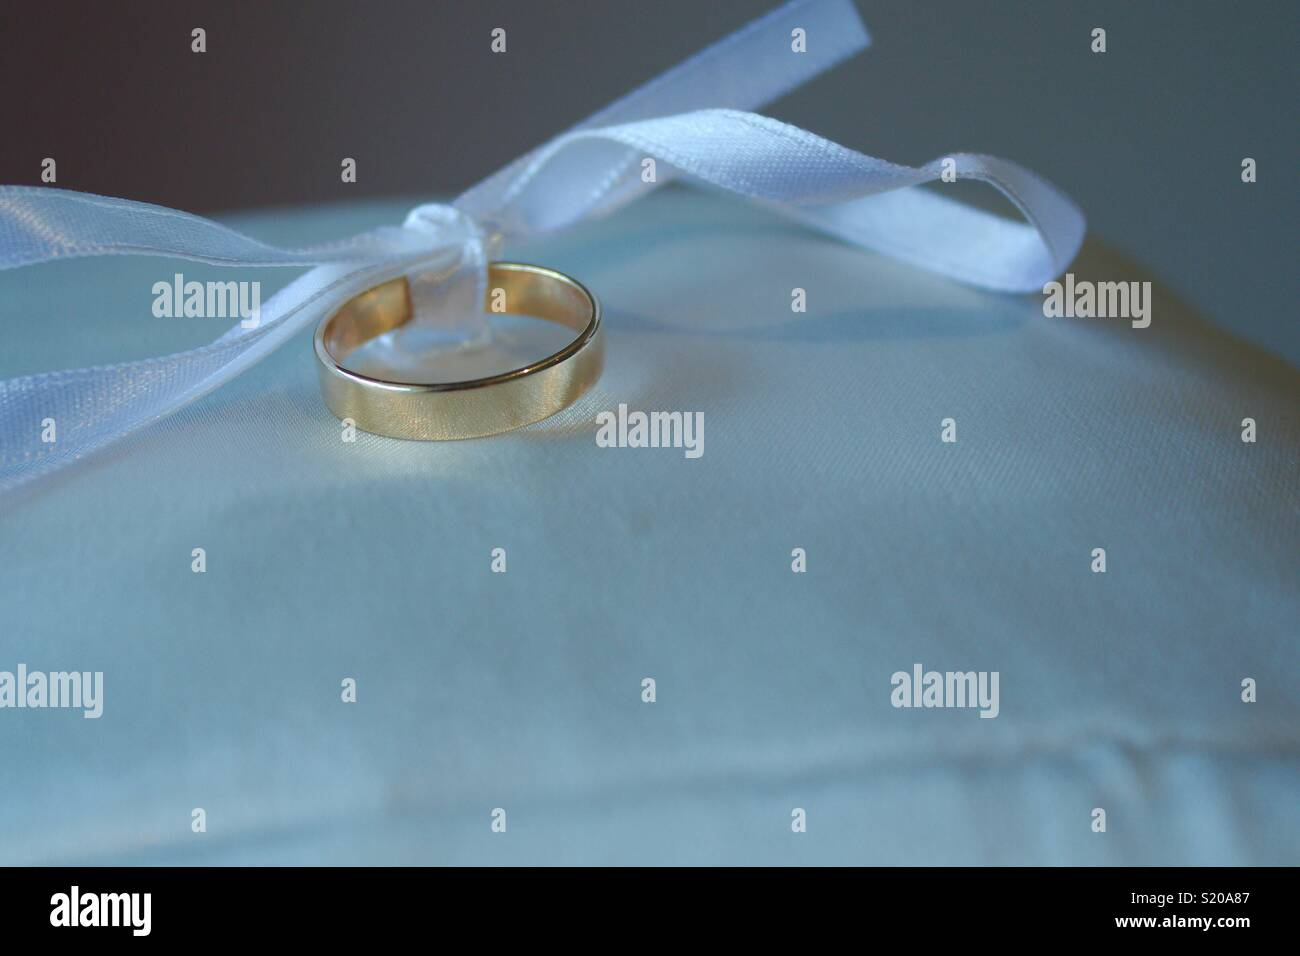 Ring Bearer Stock Photos & Ring Bearer Stock Images - Alamy